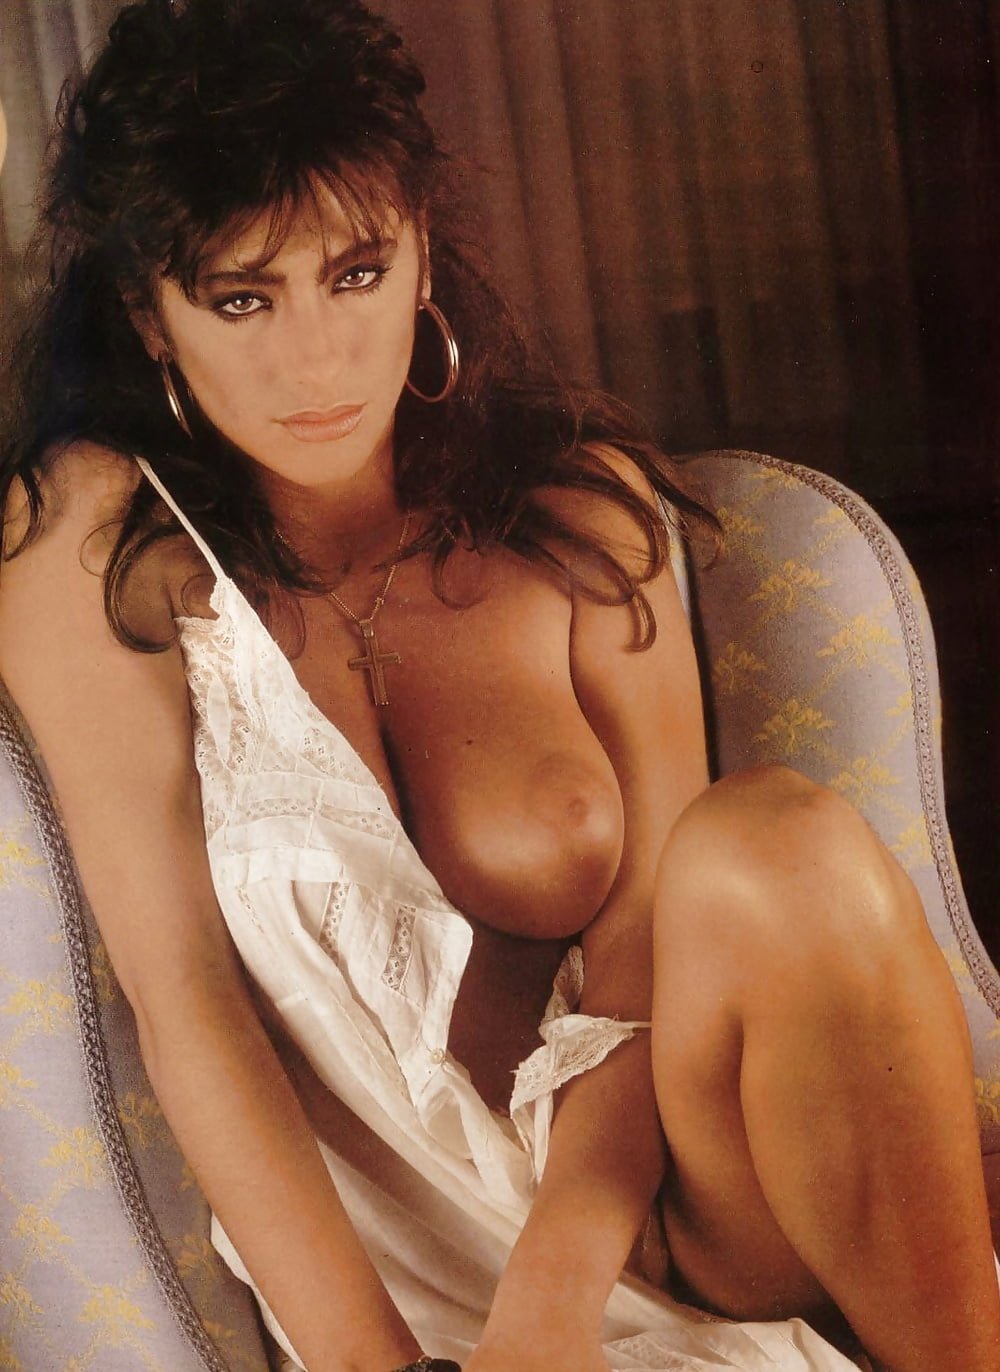 nude-girls-italian-vip-nude-law-pussy